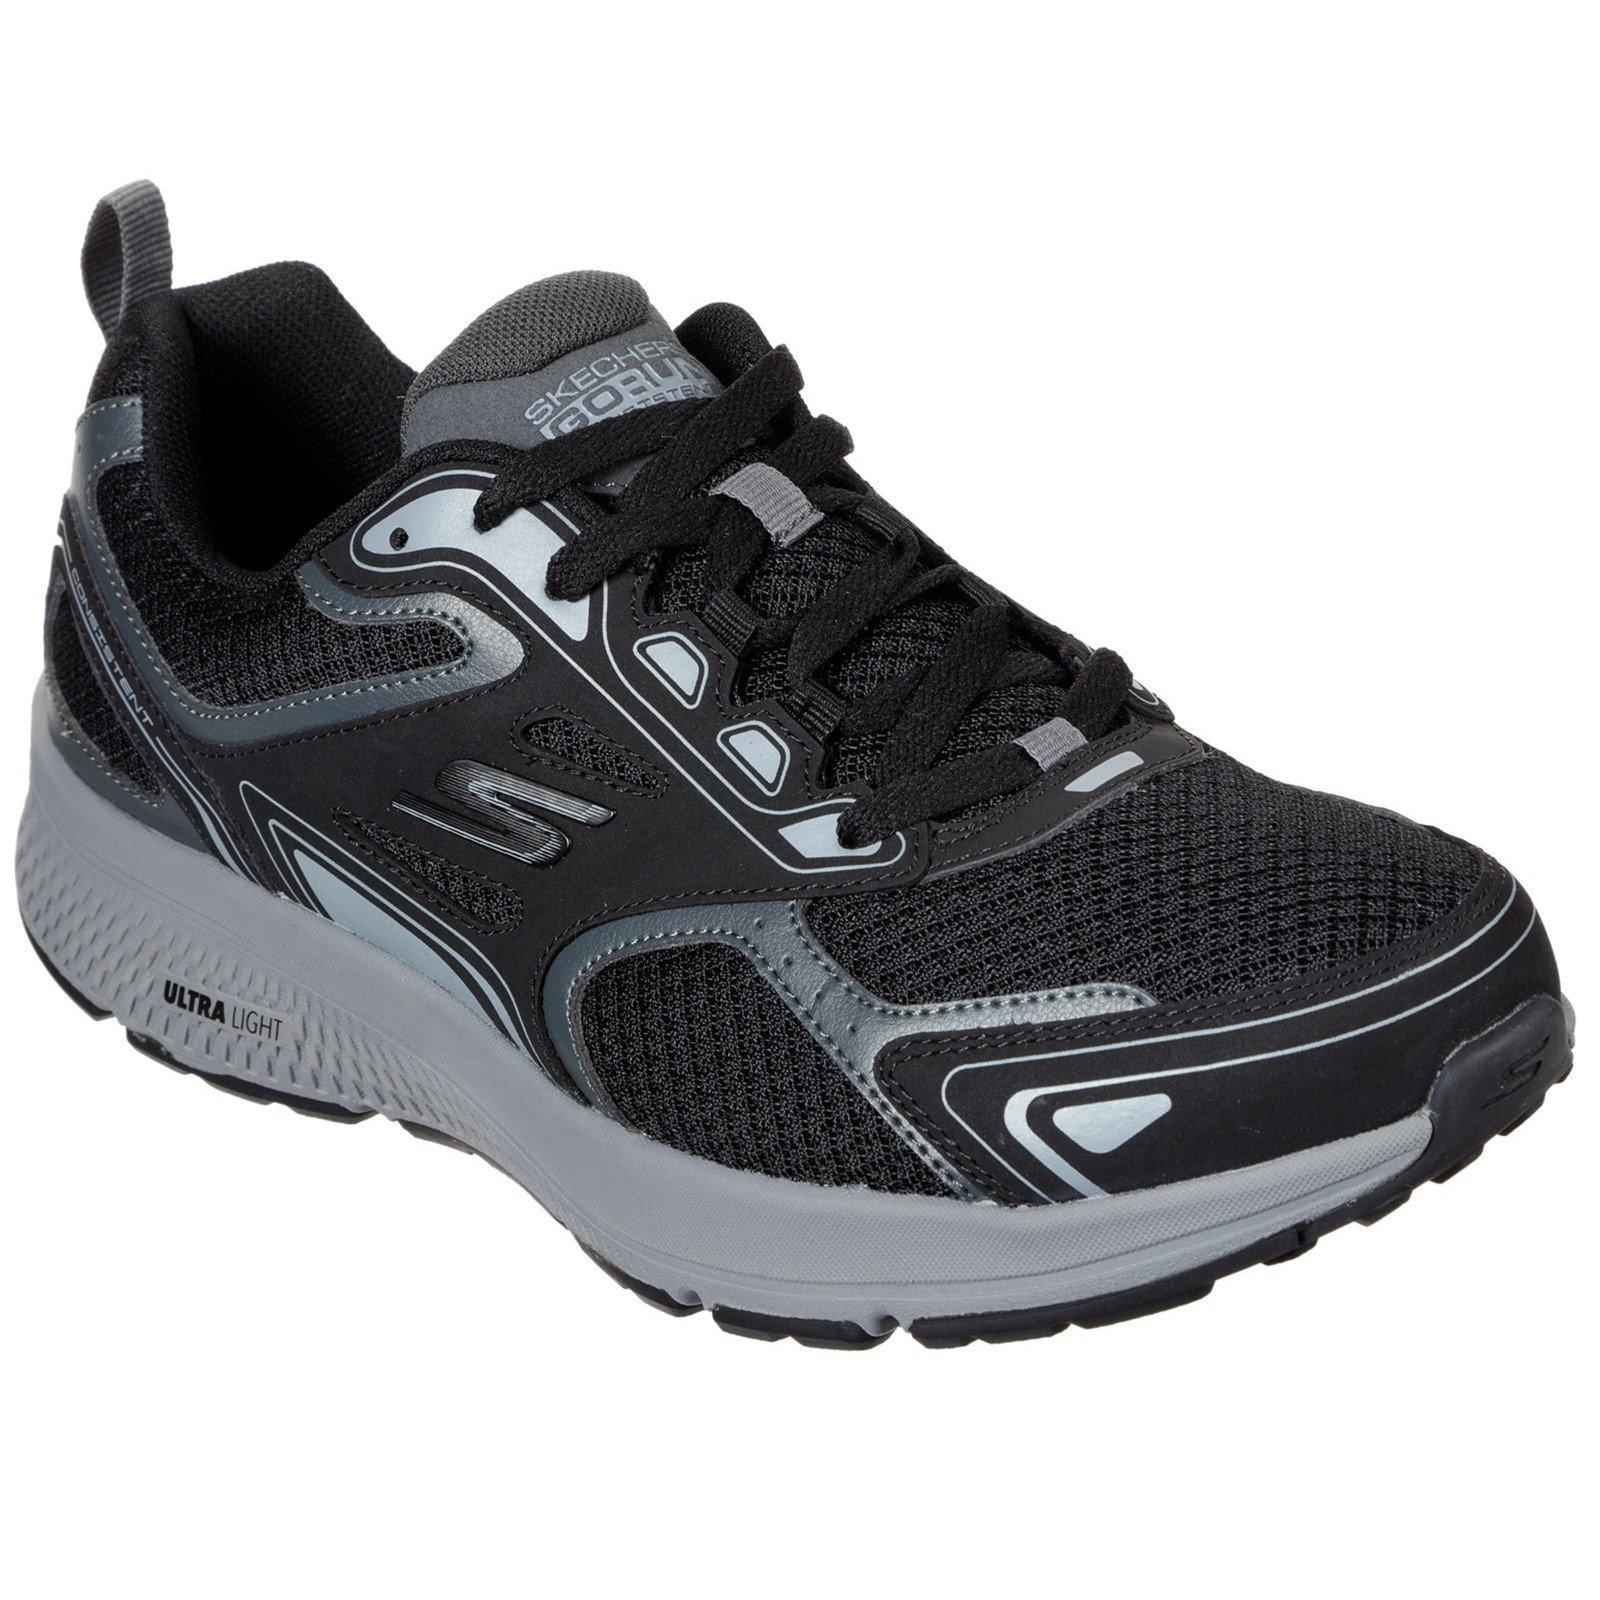 Skechers Men's Go Run Consistent Wide Trainer Multicolor 33072 - Black/Grey 9